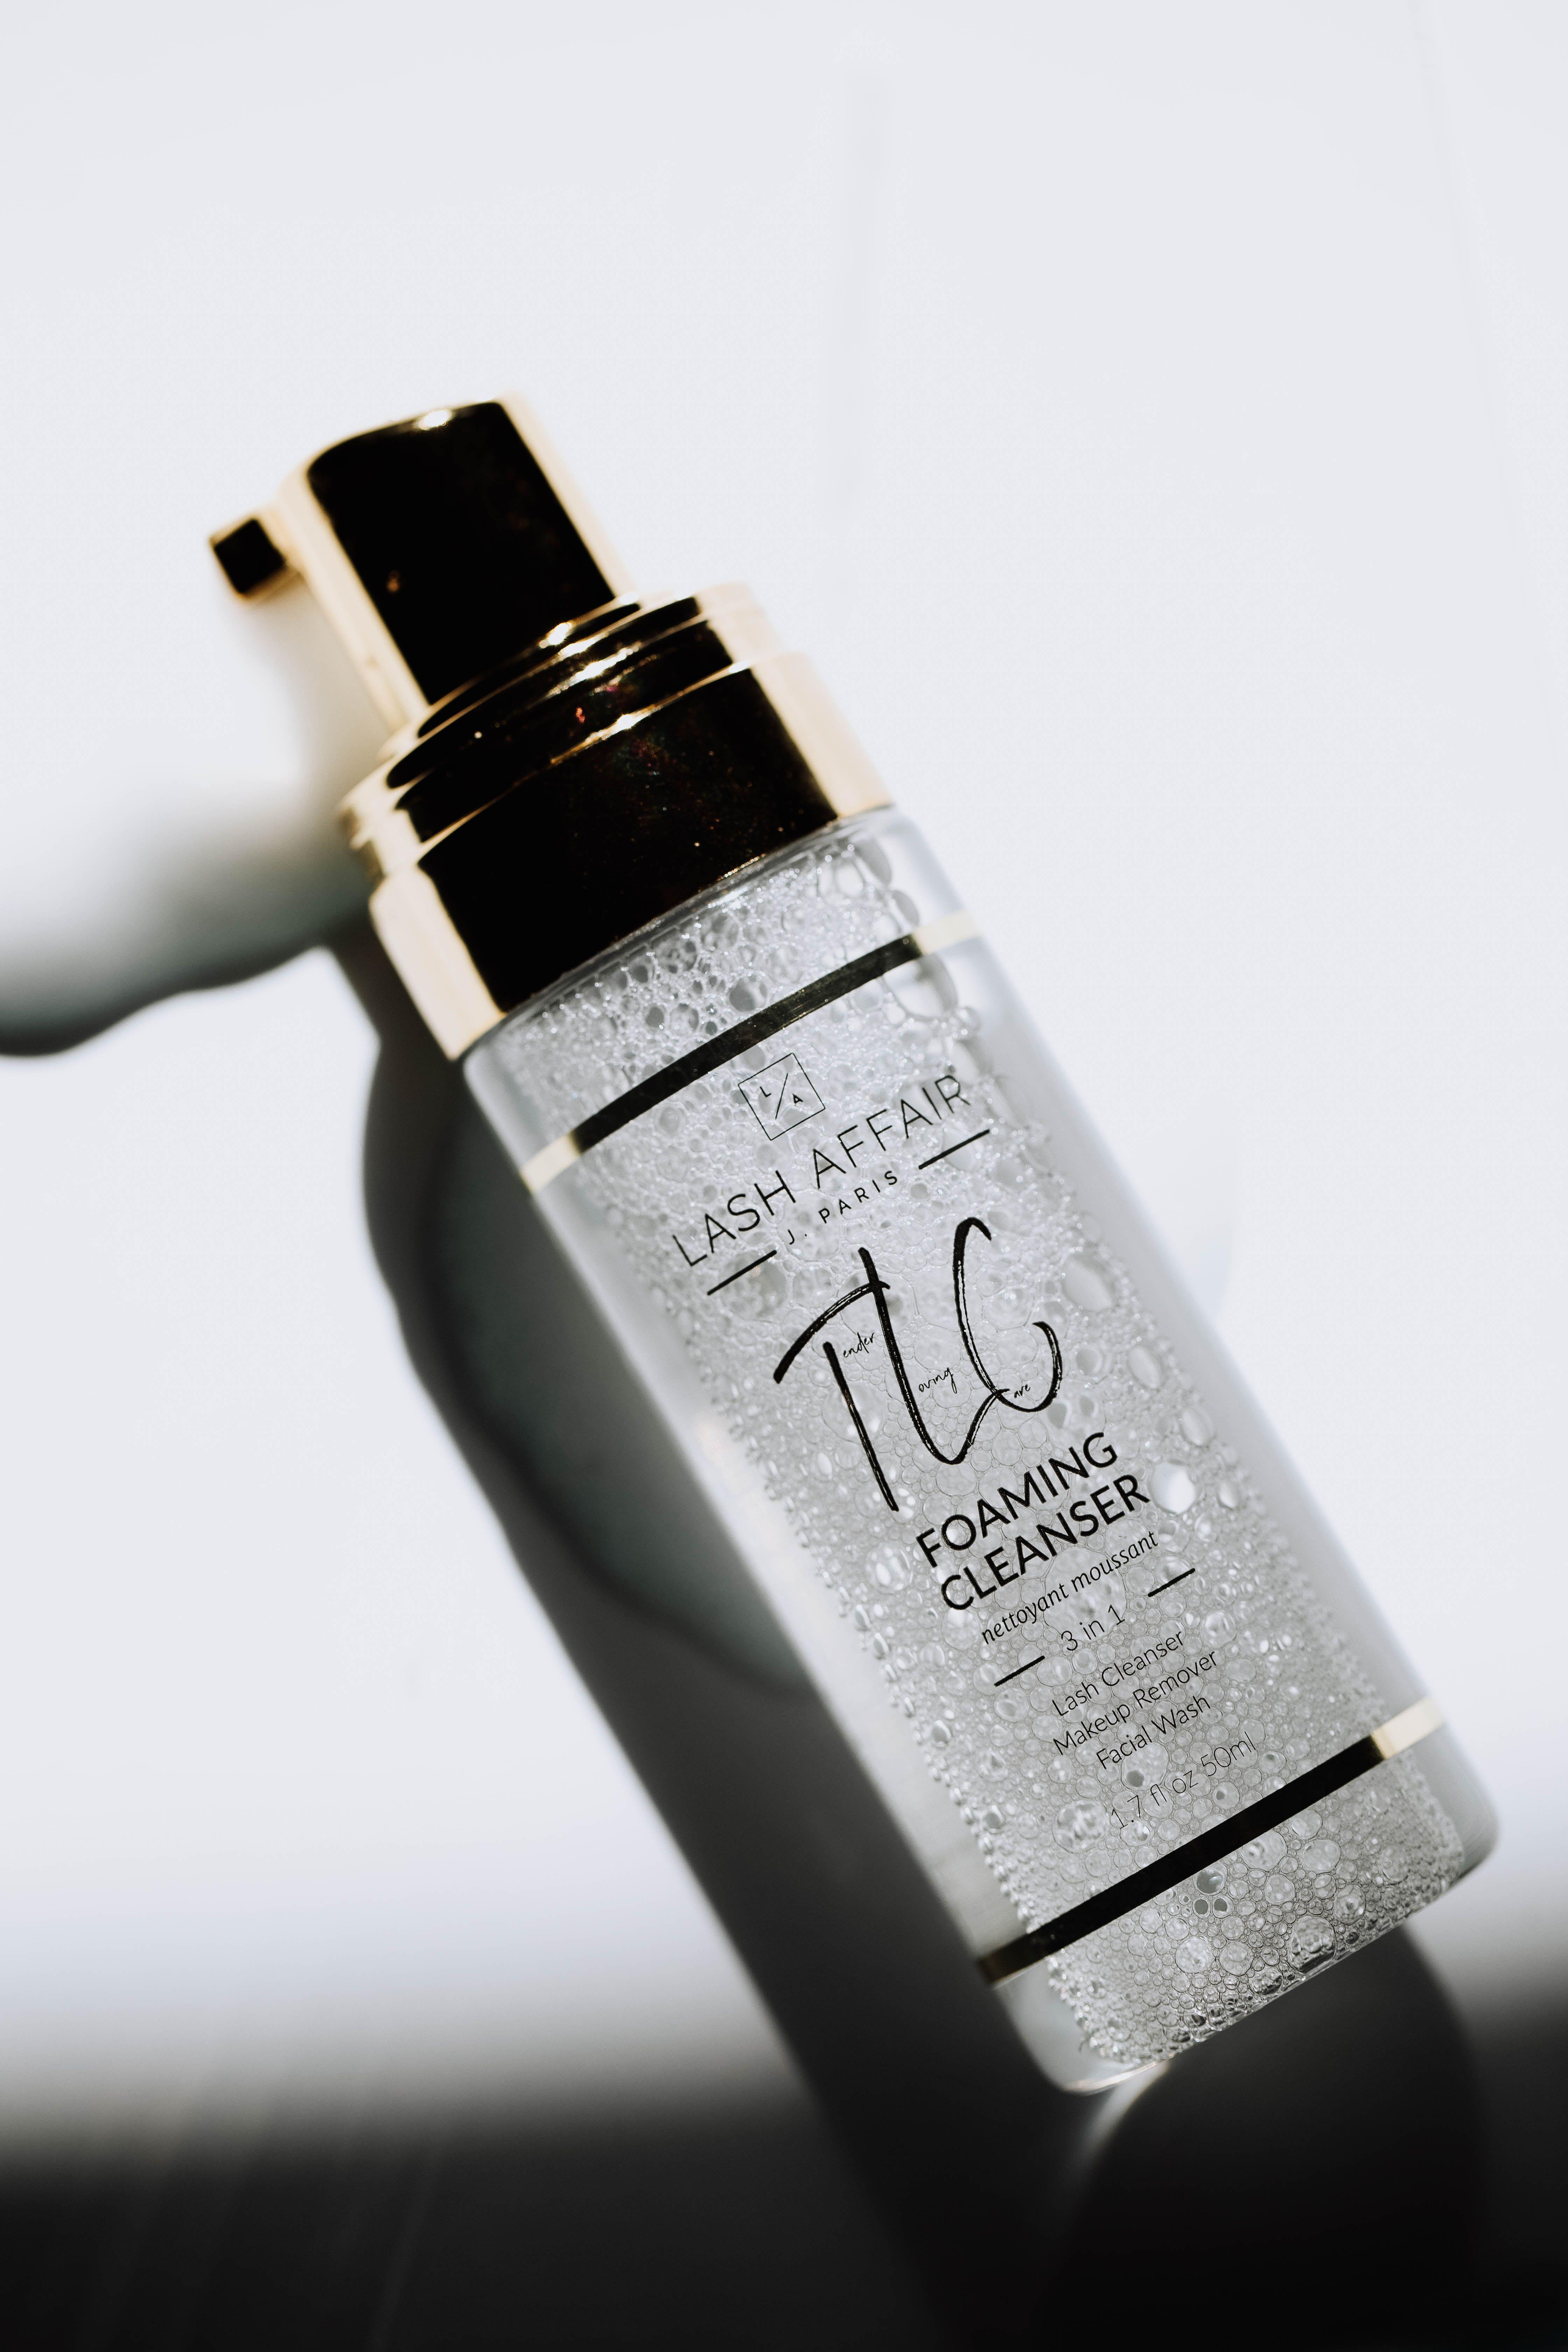 Tlc Tea Tree Cleanser Lash Face Wash Makeup Remover In 2020 Makeup Remover Tea Tree Cleanser Face Makeup Remover